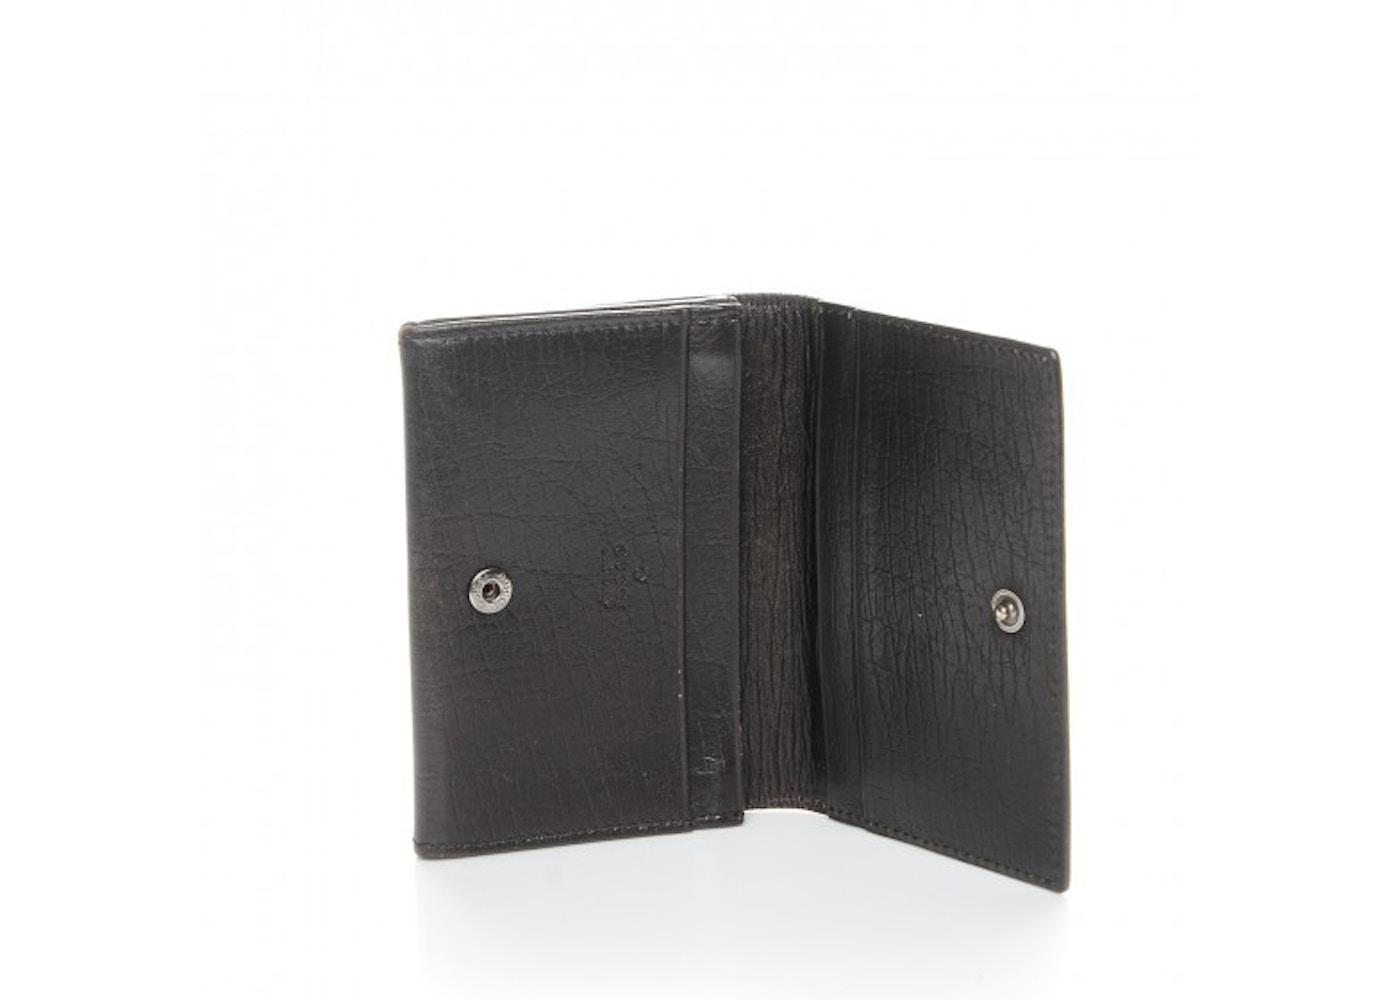 Gucci business card holder wallet monogram gg plus brownbeige colourmoves